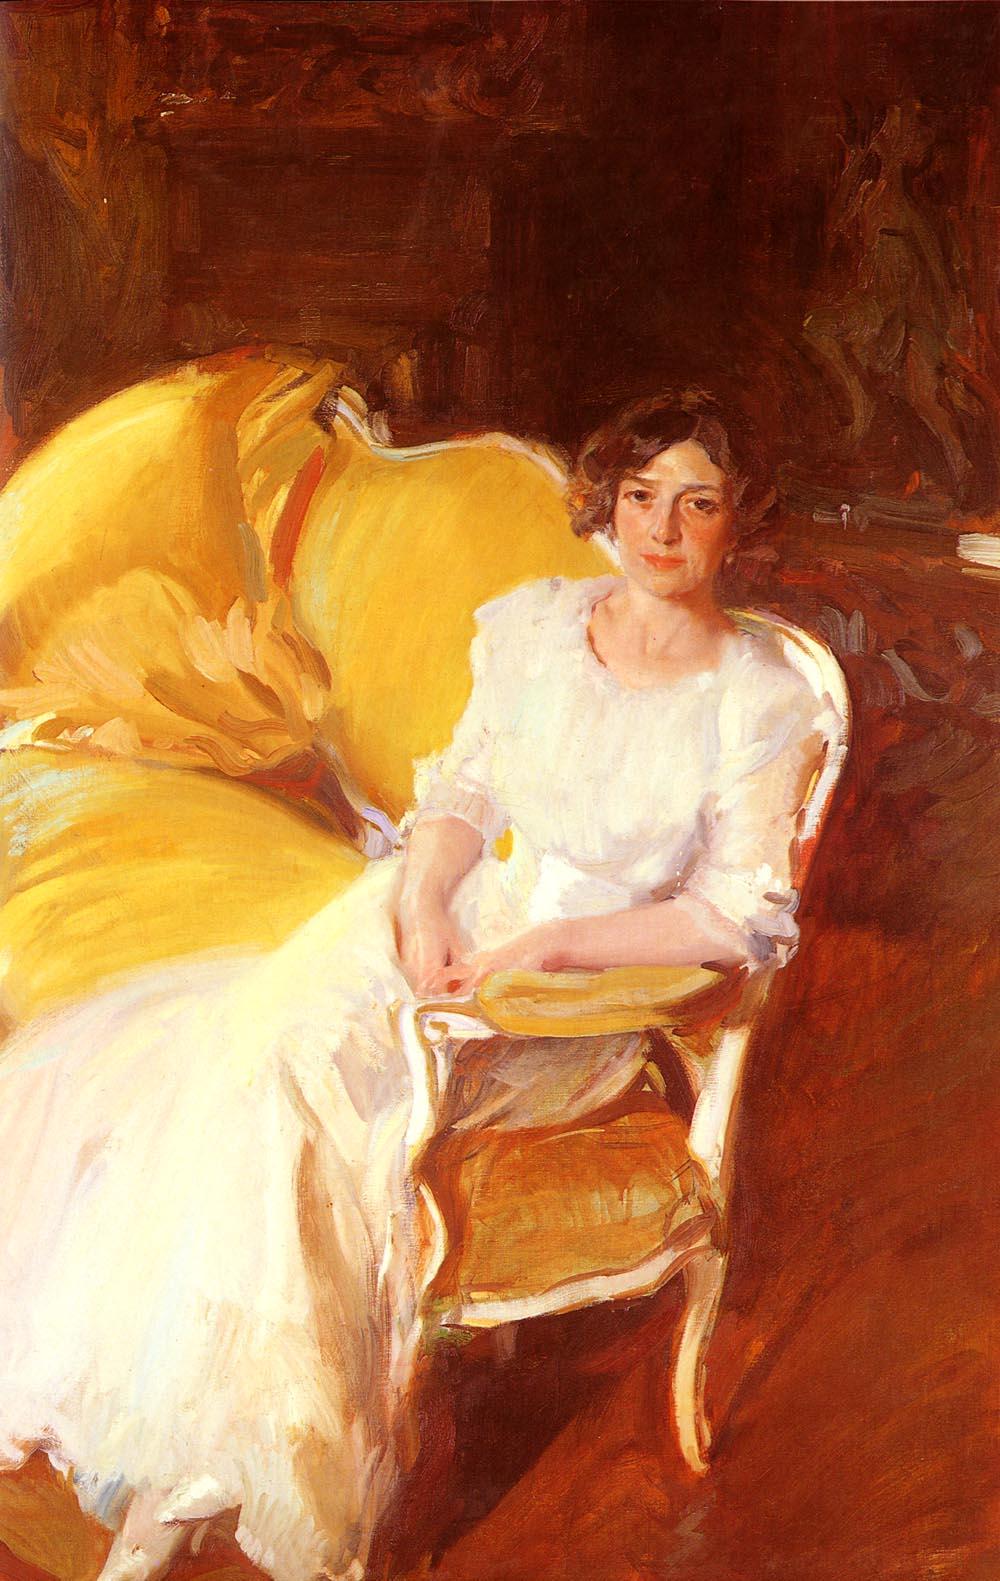 Clotilde Sentada En El Sofa | Joaquin Y Bastida Sorolla | oil painting